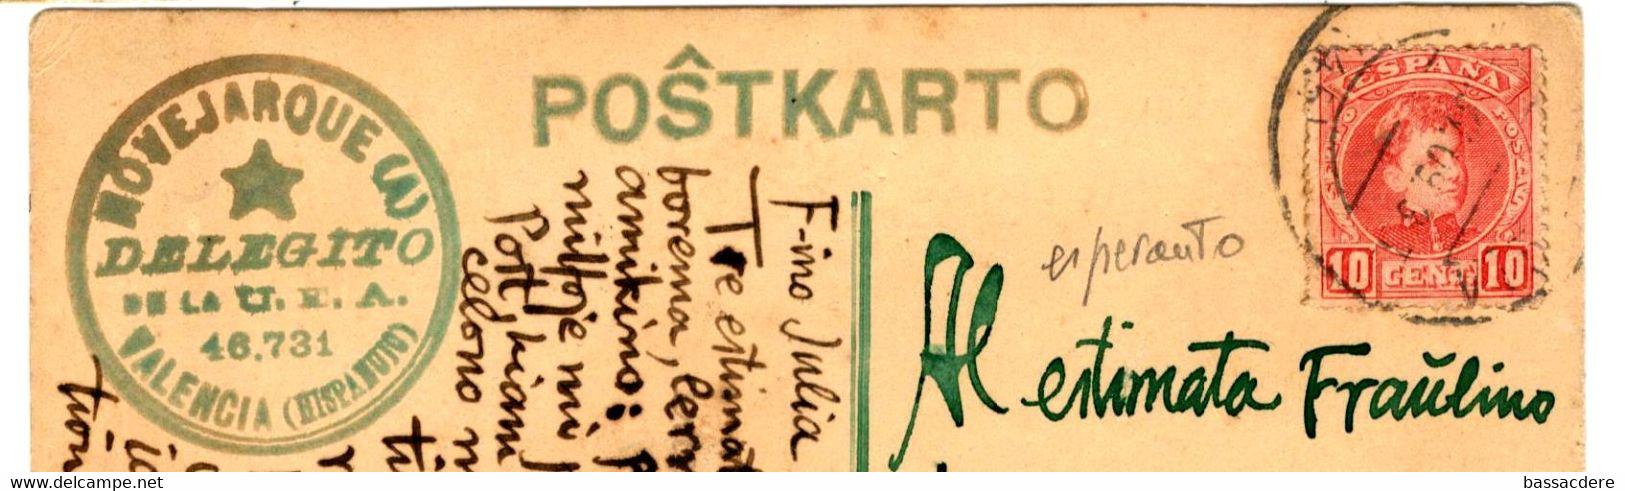 46995 - POSTKARTO - Cartas